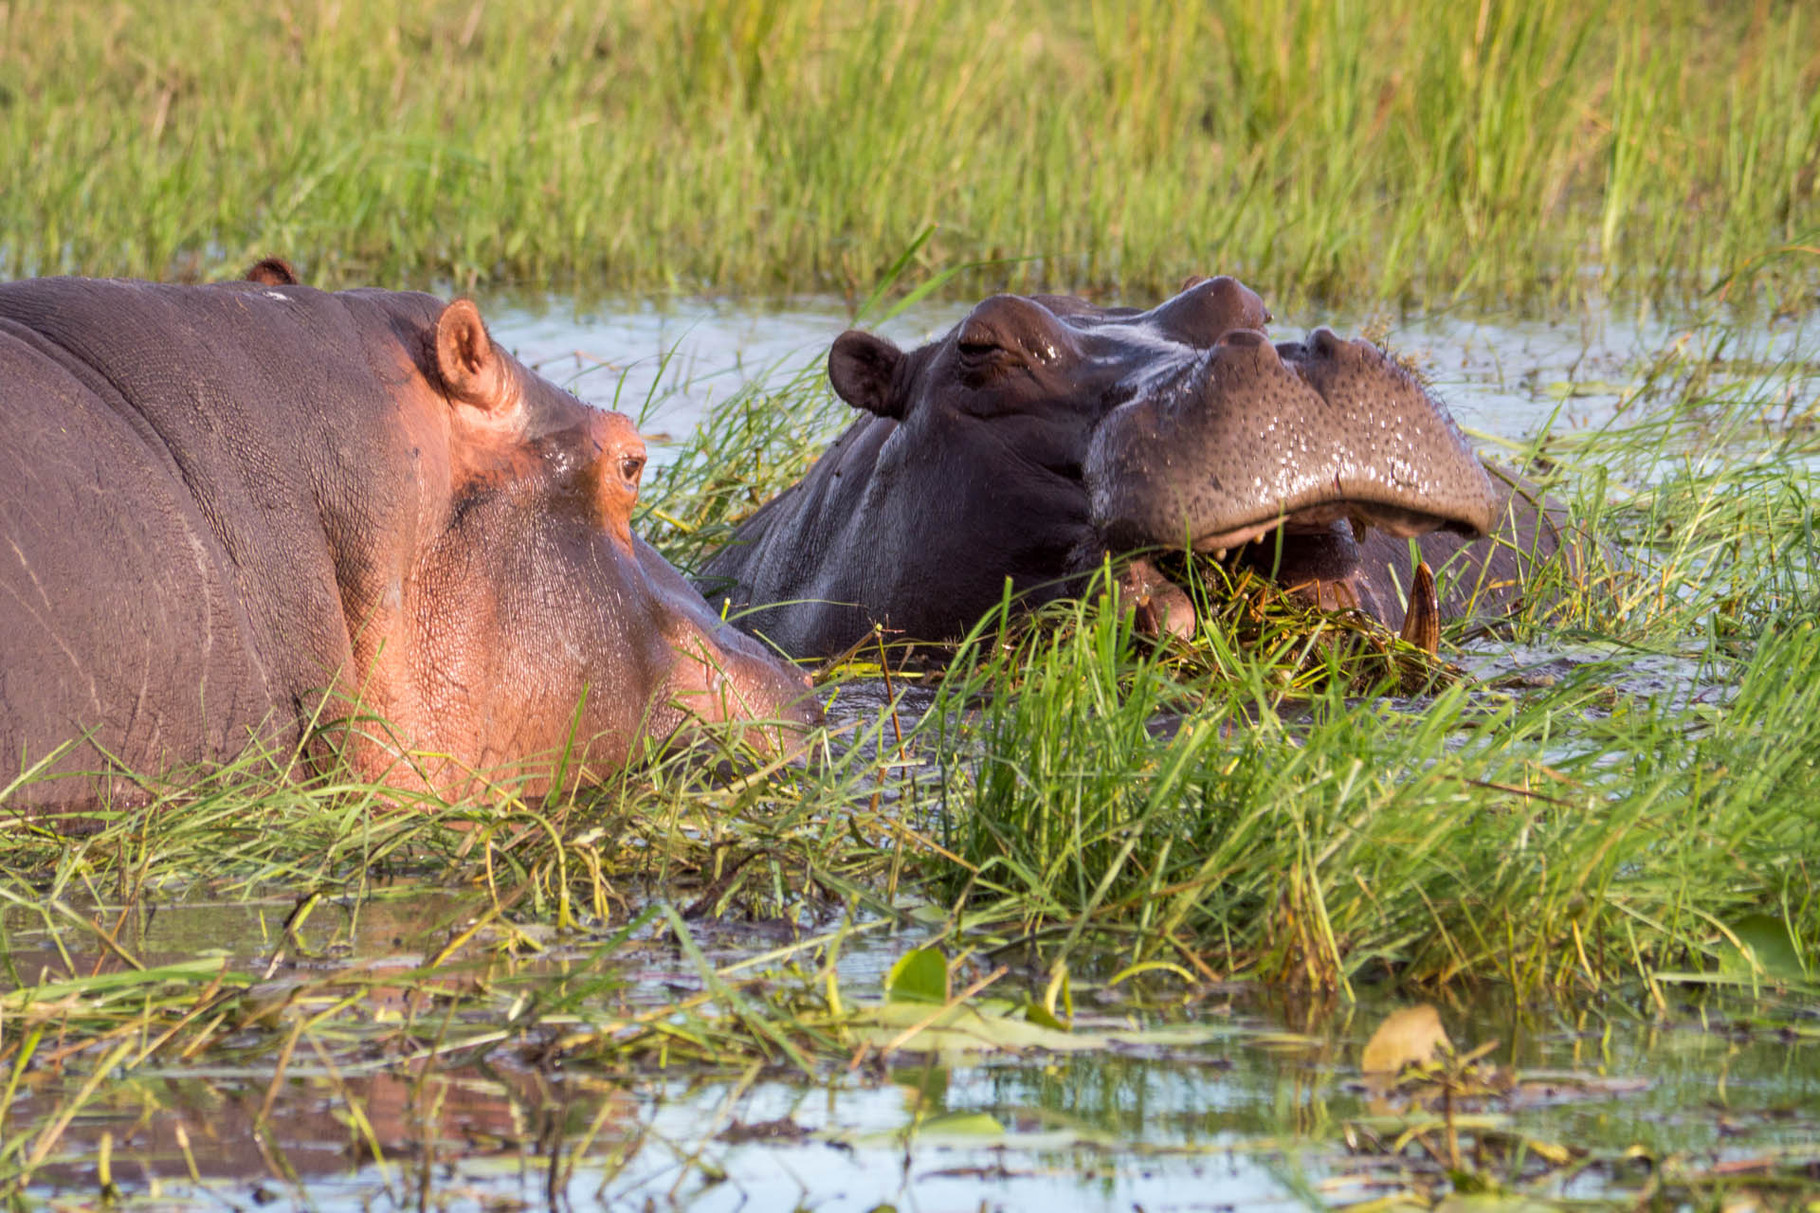 Hippos [Chobe Park, Botswana, 2015]